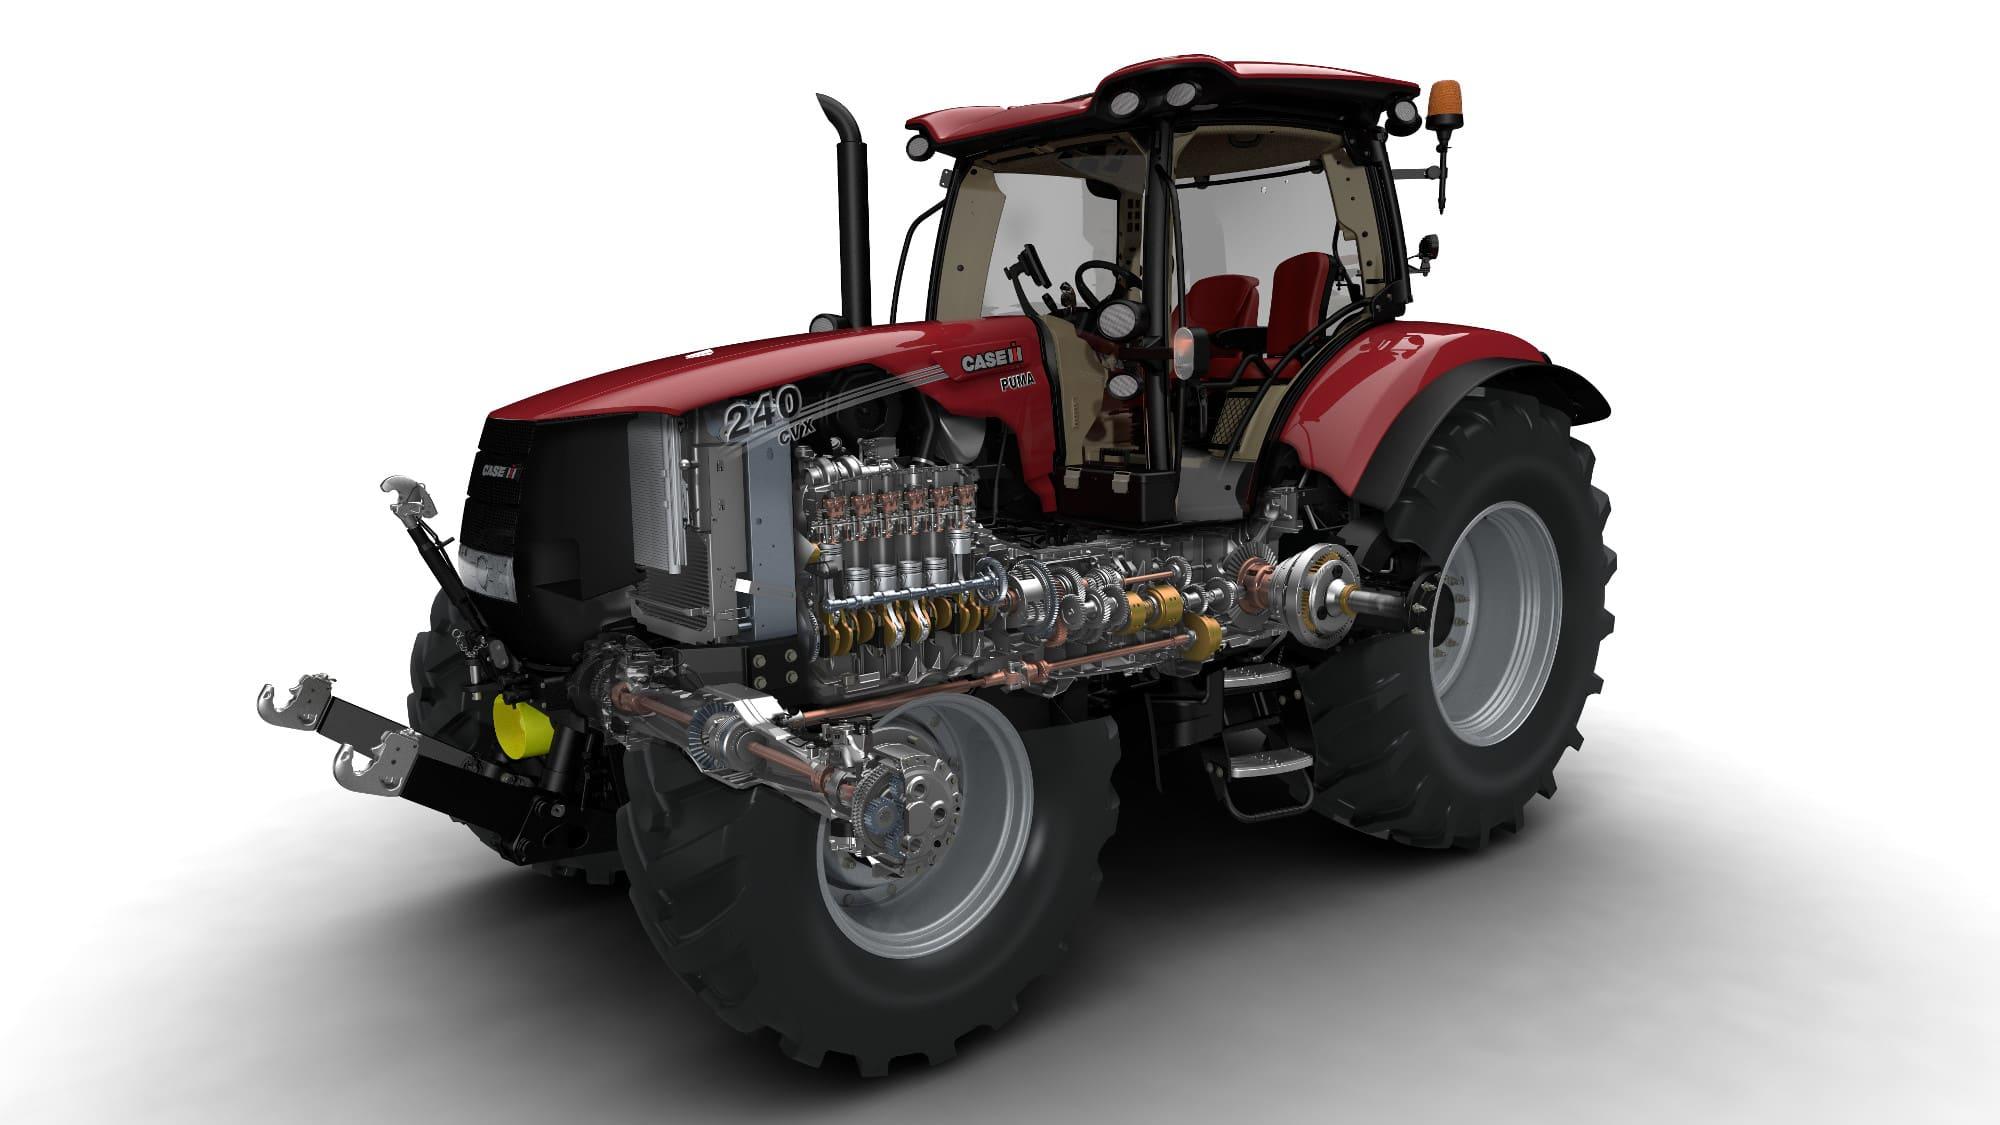 Magnum Tractor Transmission Diagram | Wiring Diagram on